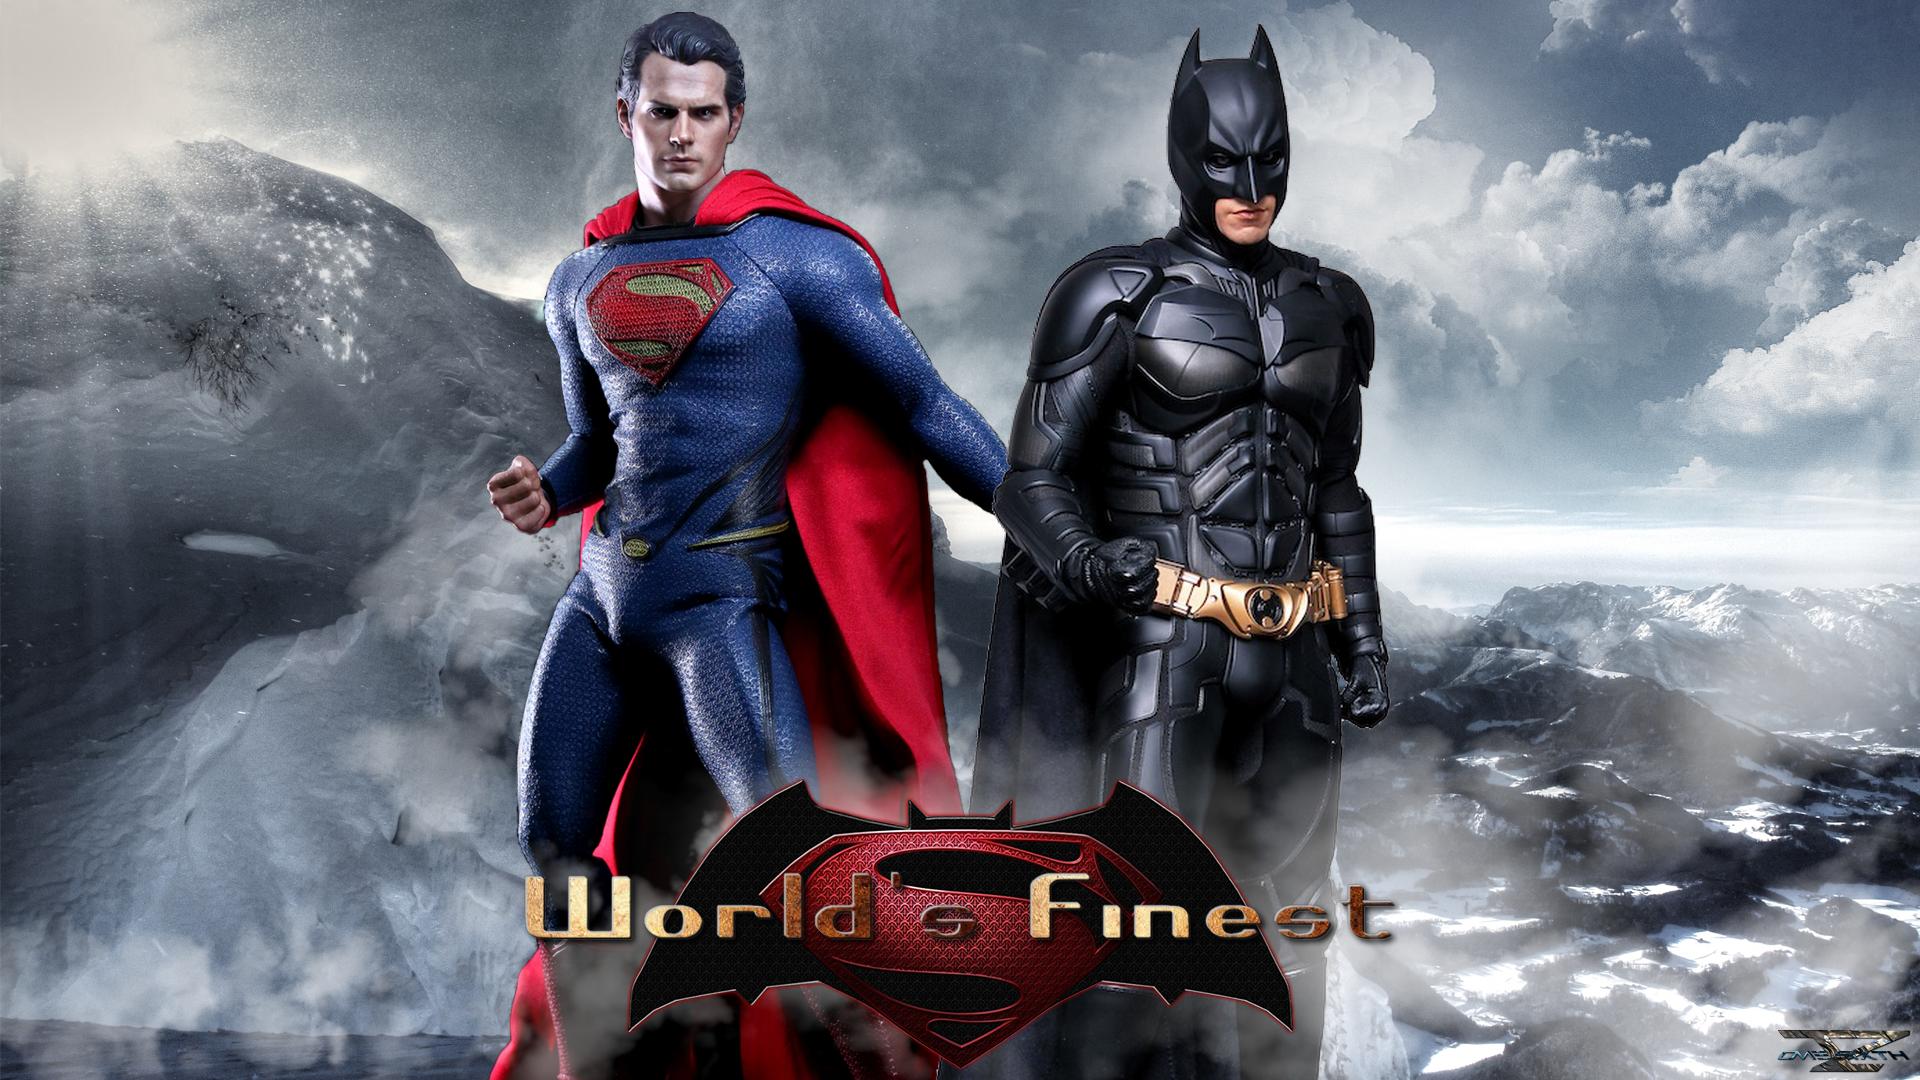 Batman Vs Superman   Worlds Finest Hot Toys Full HD Wallpaper 1920x1080